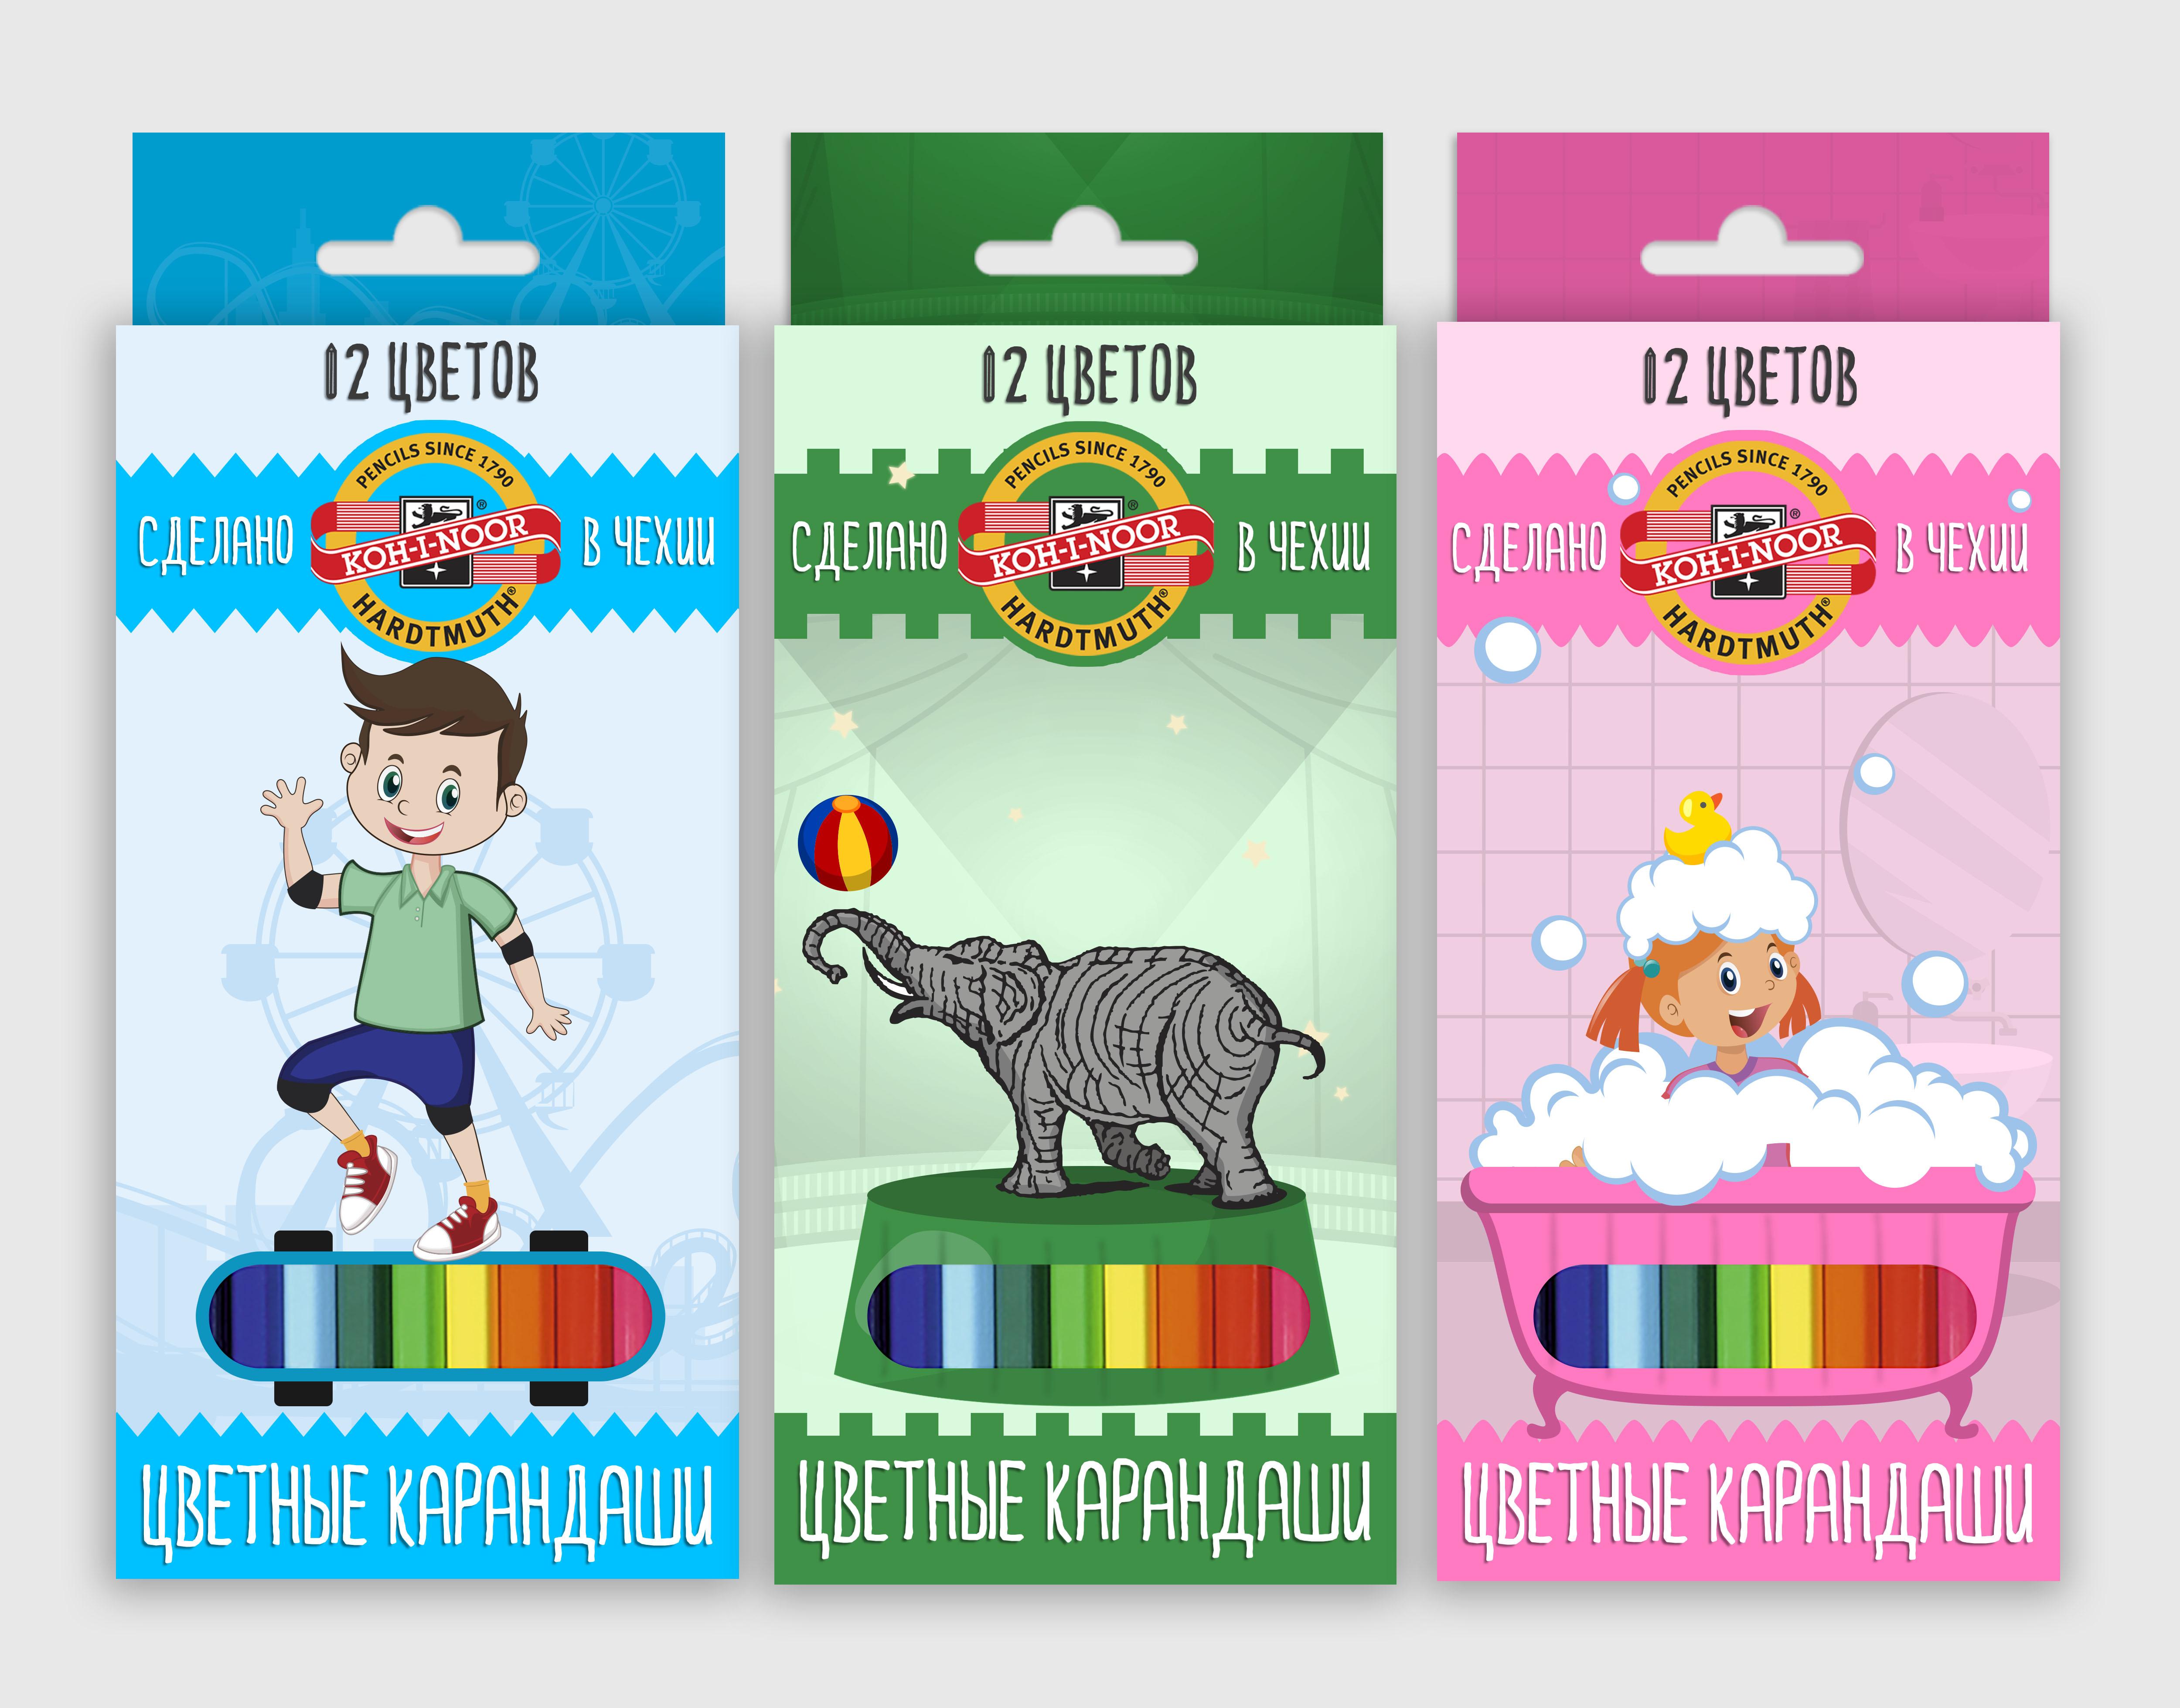 Разработка дизайна упаковки для чешского бренда KOH-I-NOOR фото f_13159f0871a45726.jpg